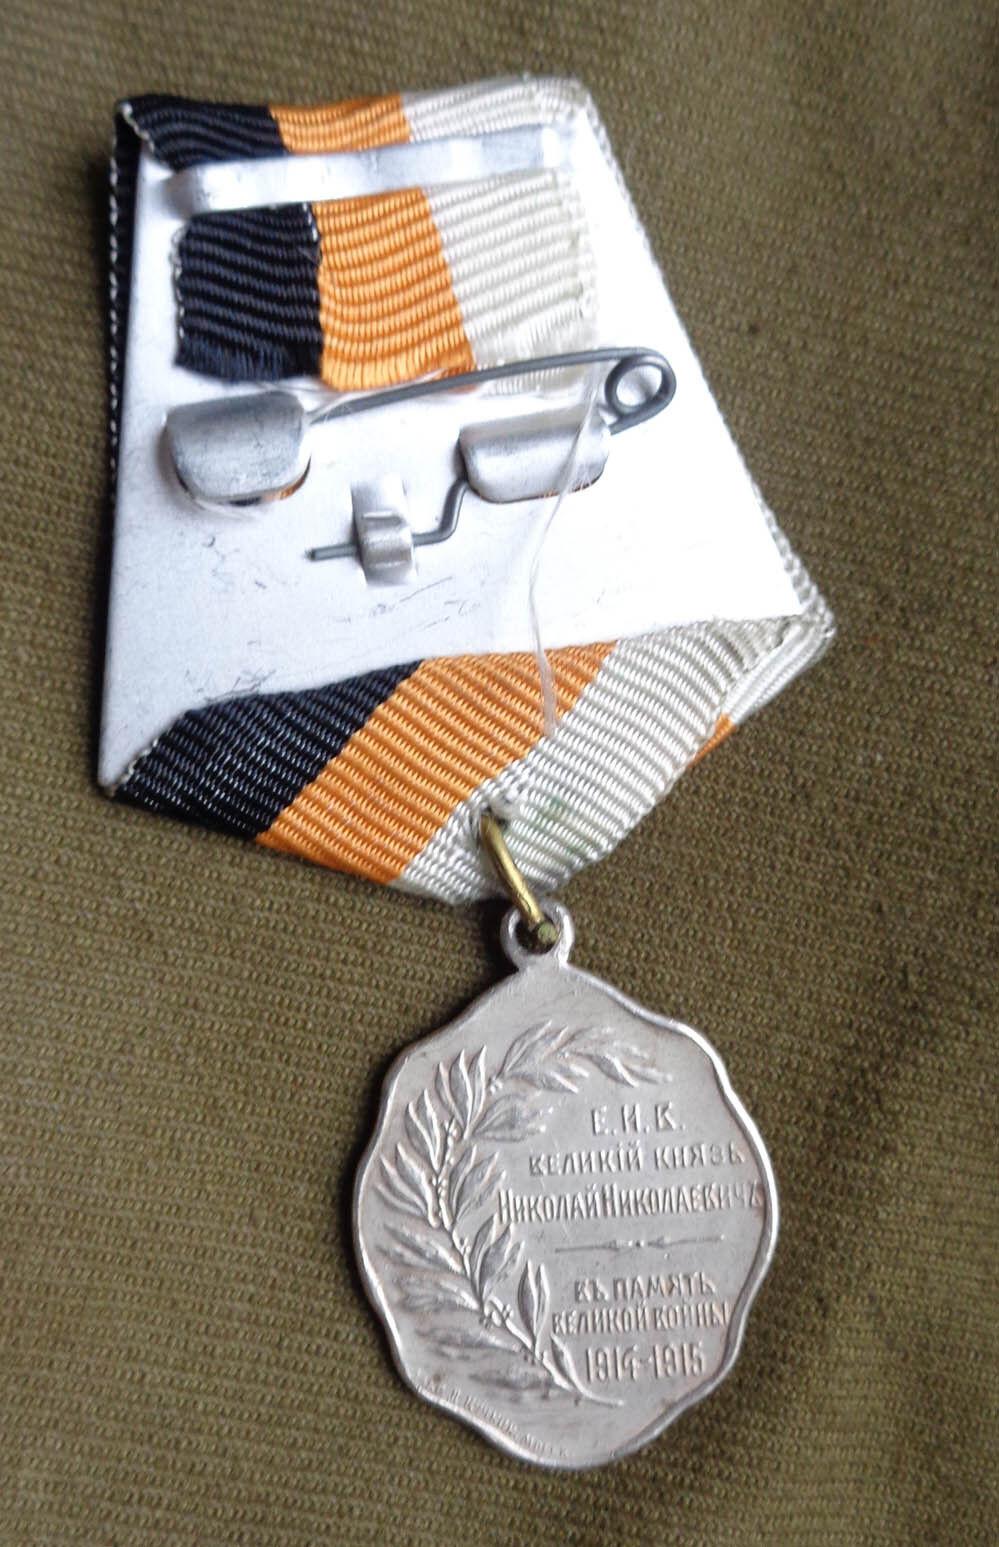 Souvenir aus Russland Helm Metall Melchior № 930562ц